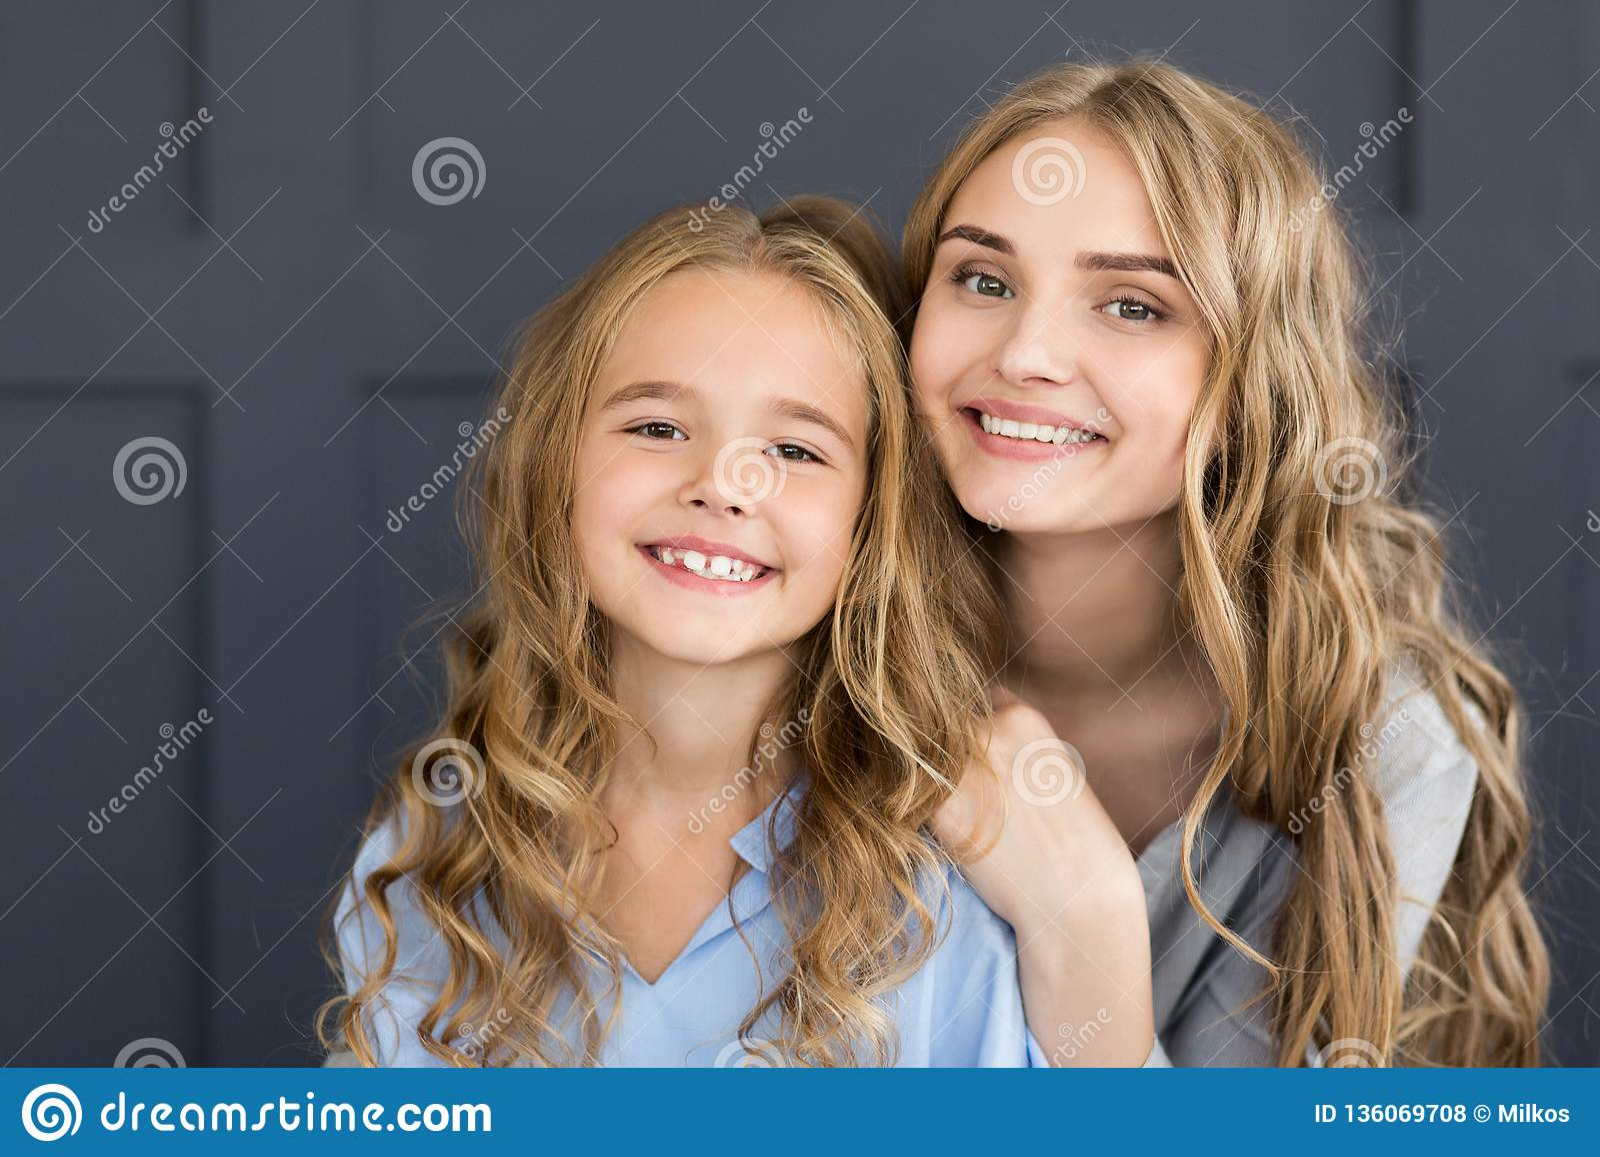 Joyful mother and daughter smiling at camera